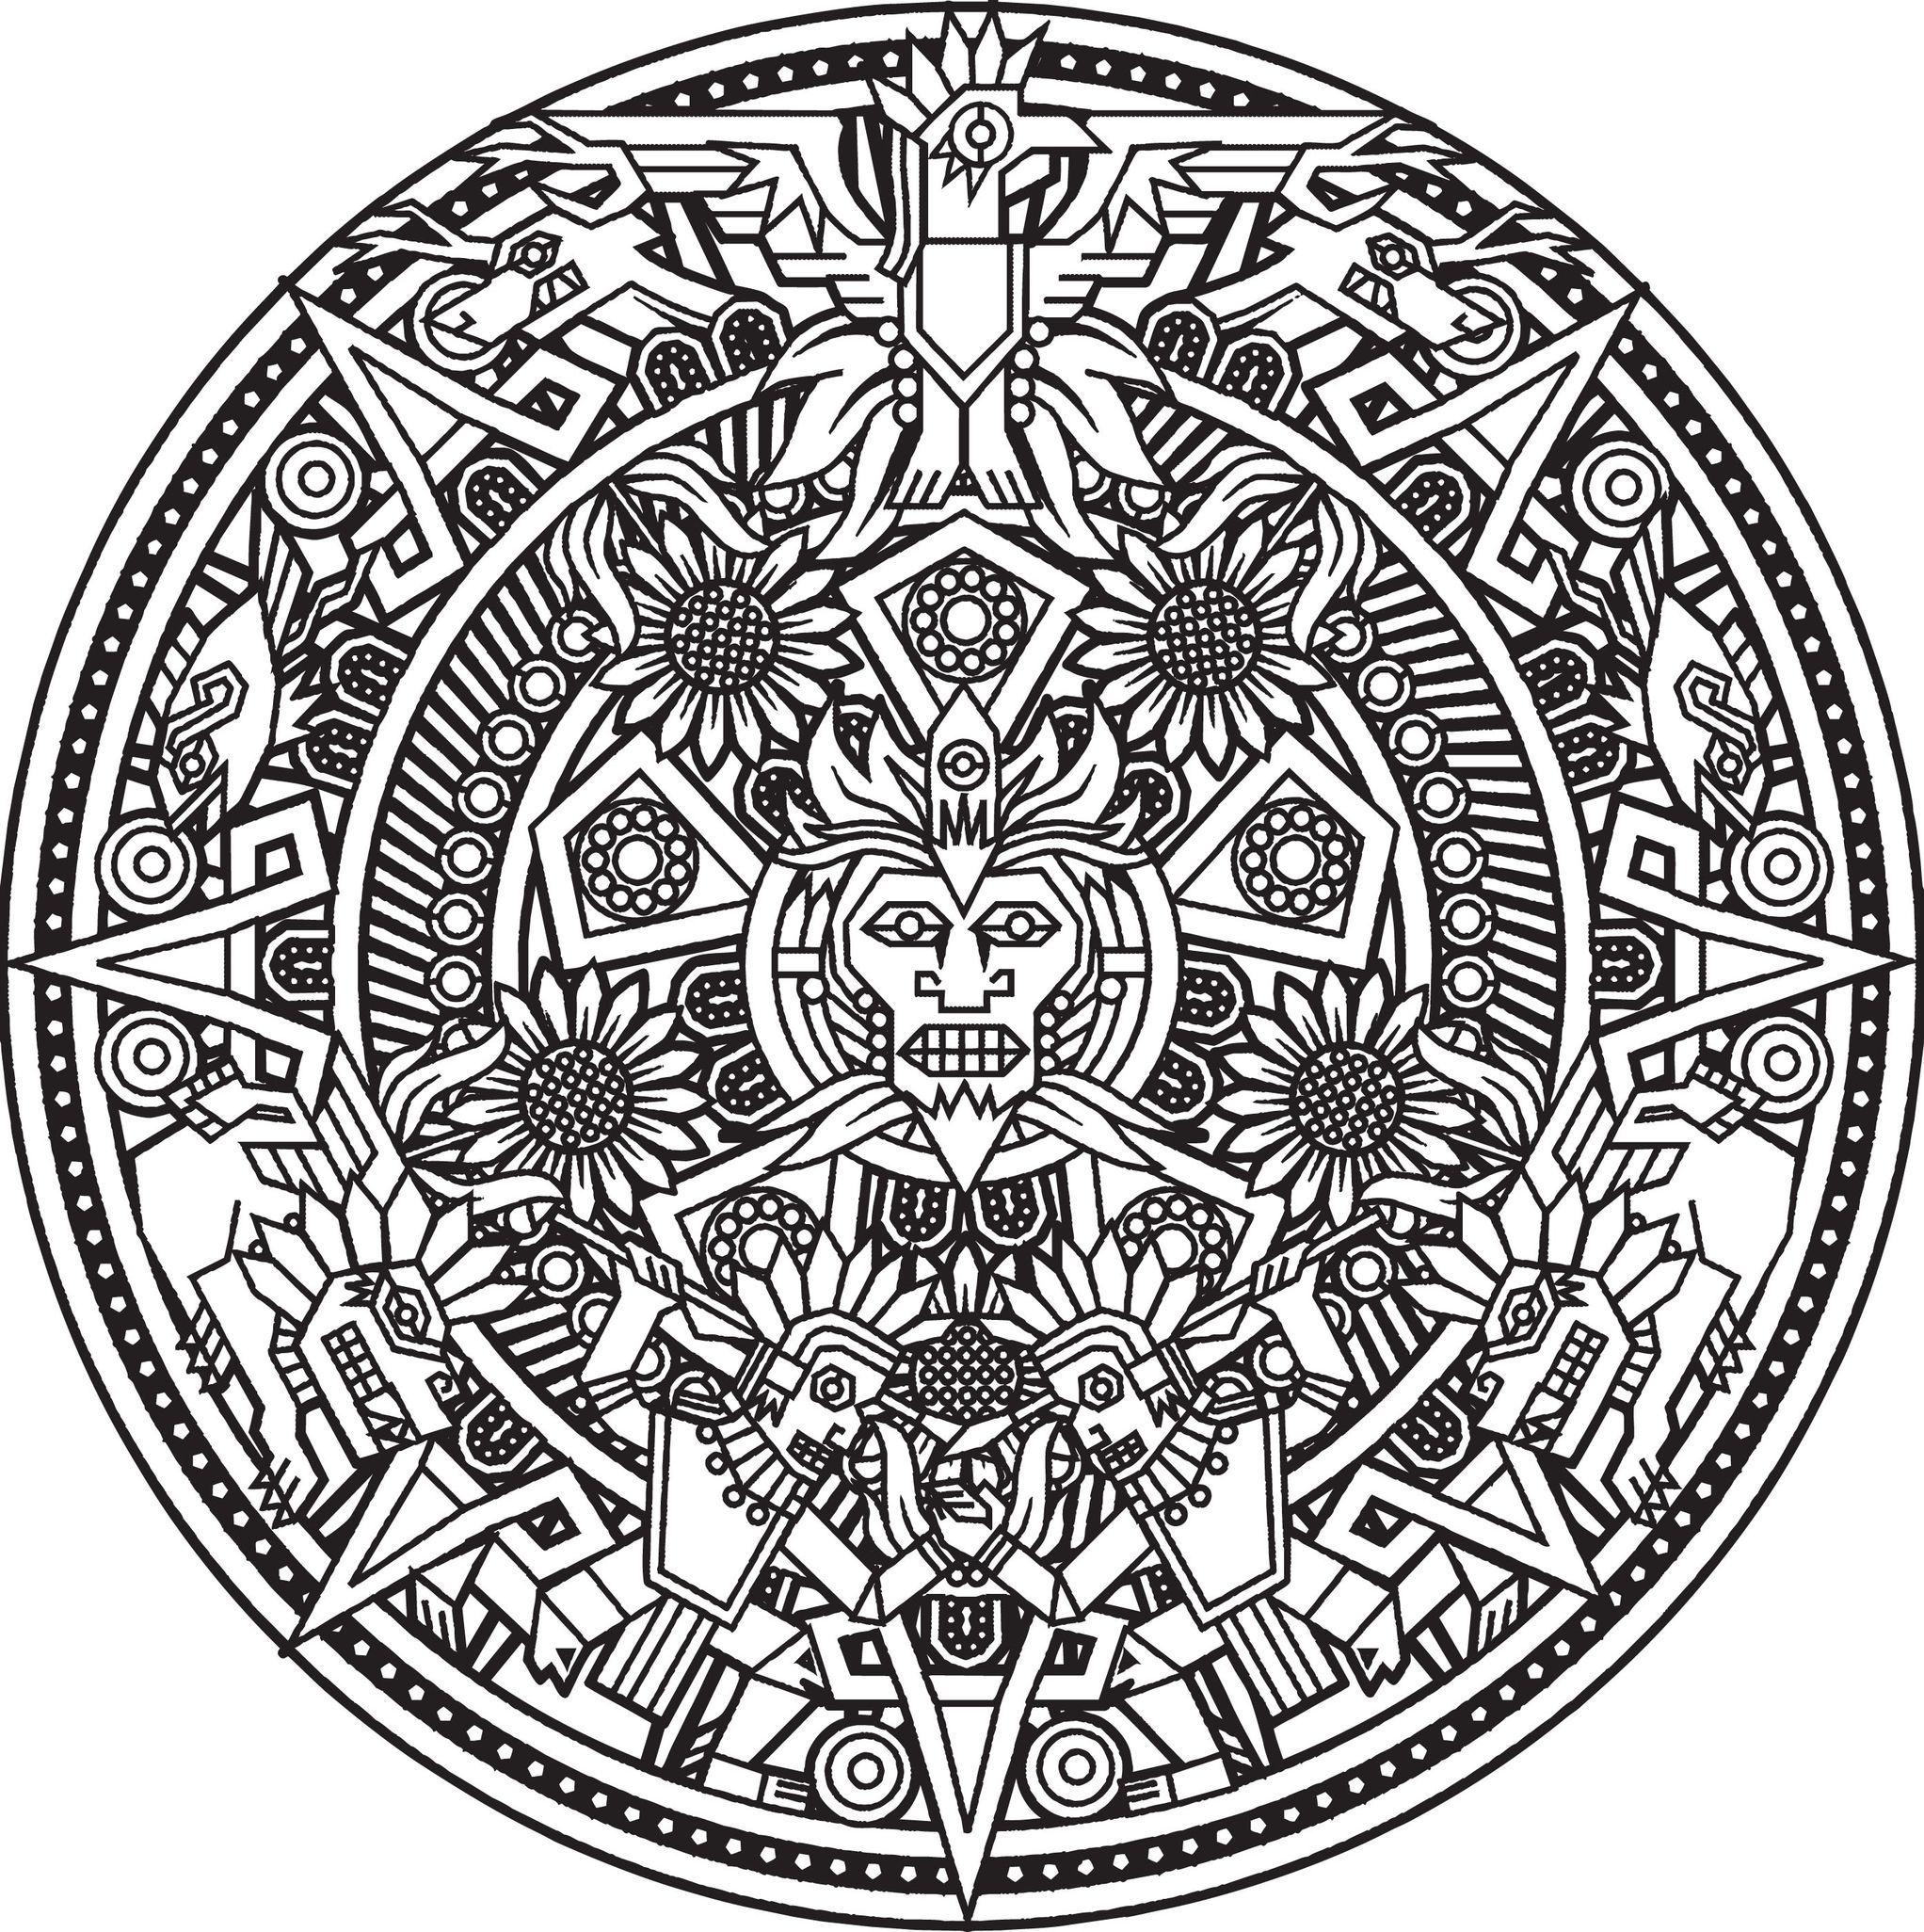 Mandala Inca Or Maya God To Color Mandalas Coloring Pages For